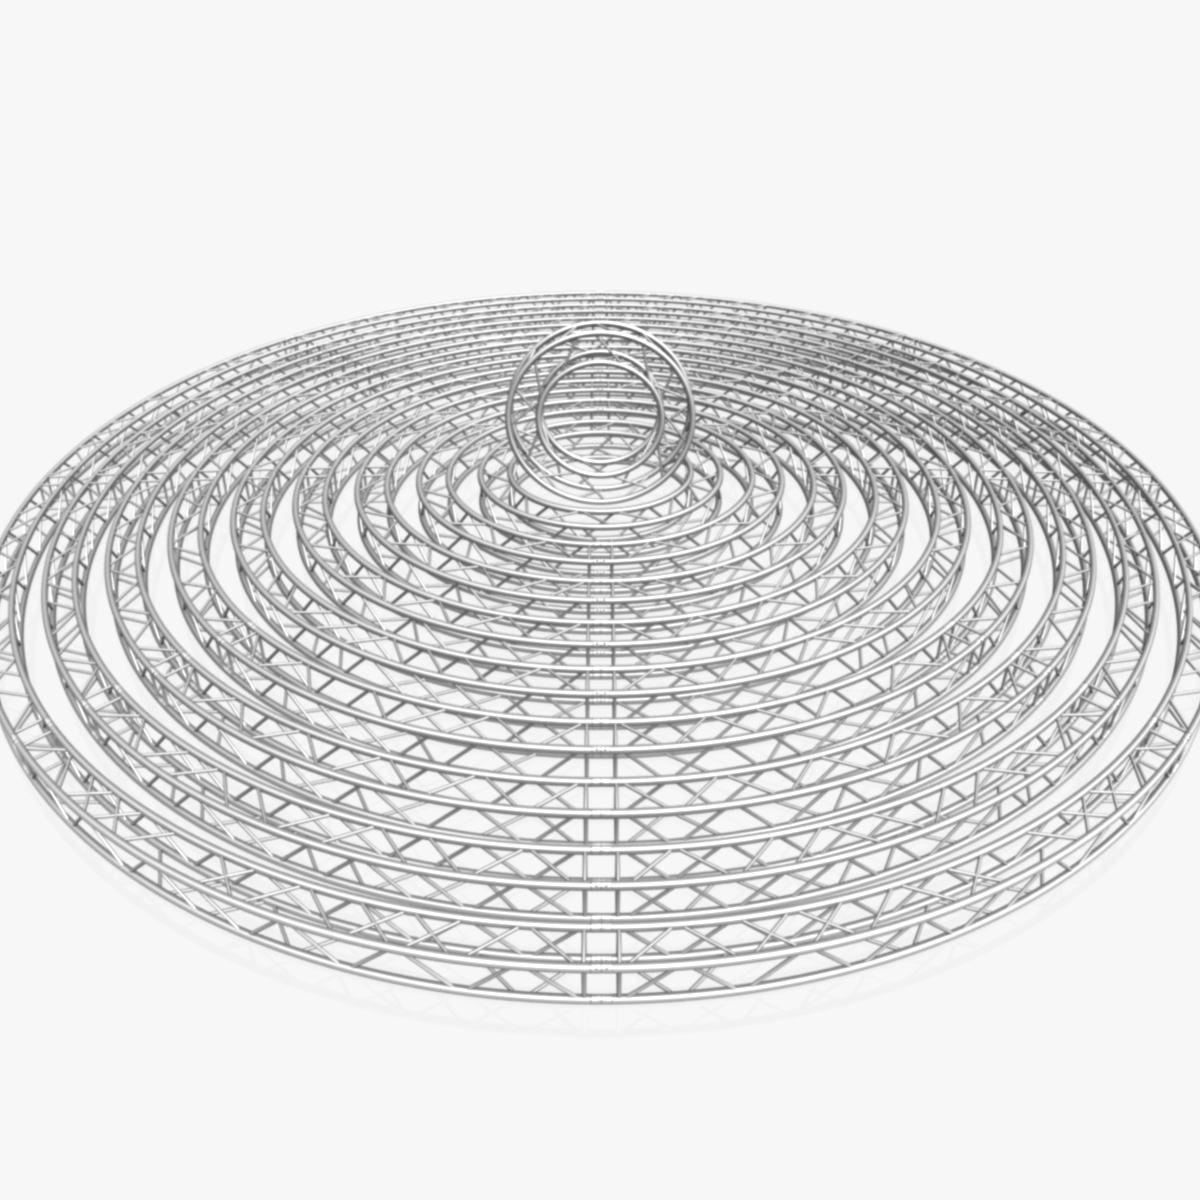 circle square truss modular collection 3d model 3ds max dxf fbx c4d dae  texture obj 252326